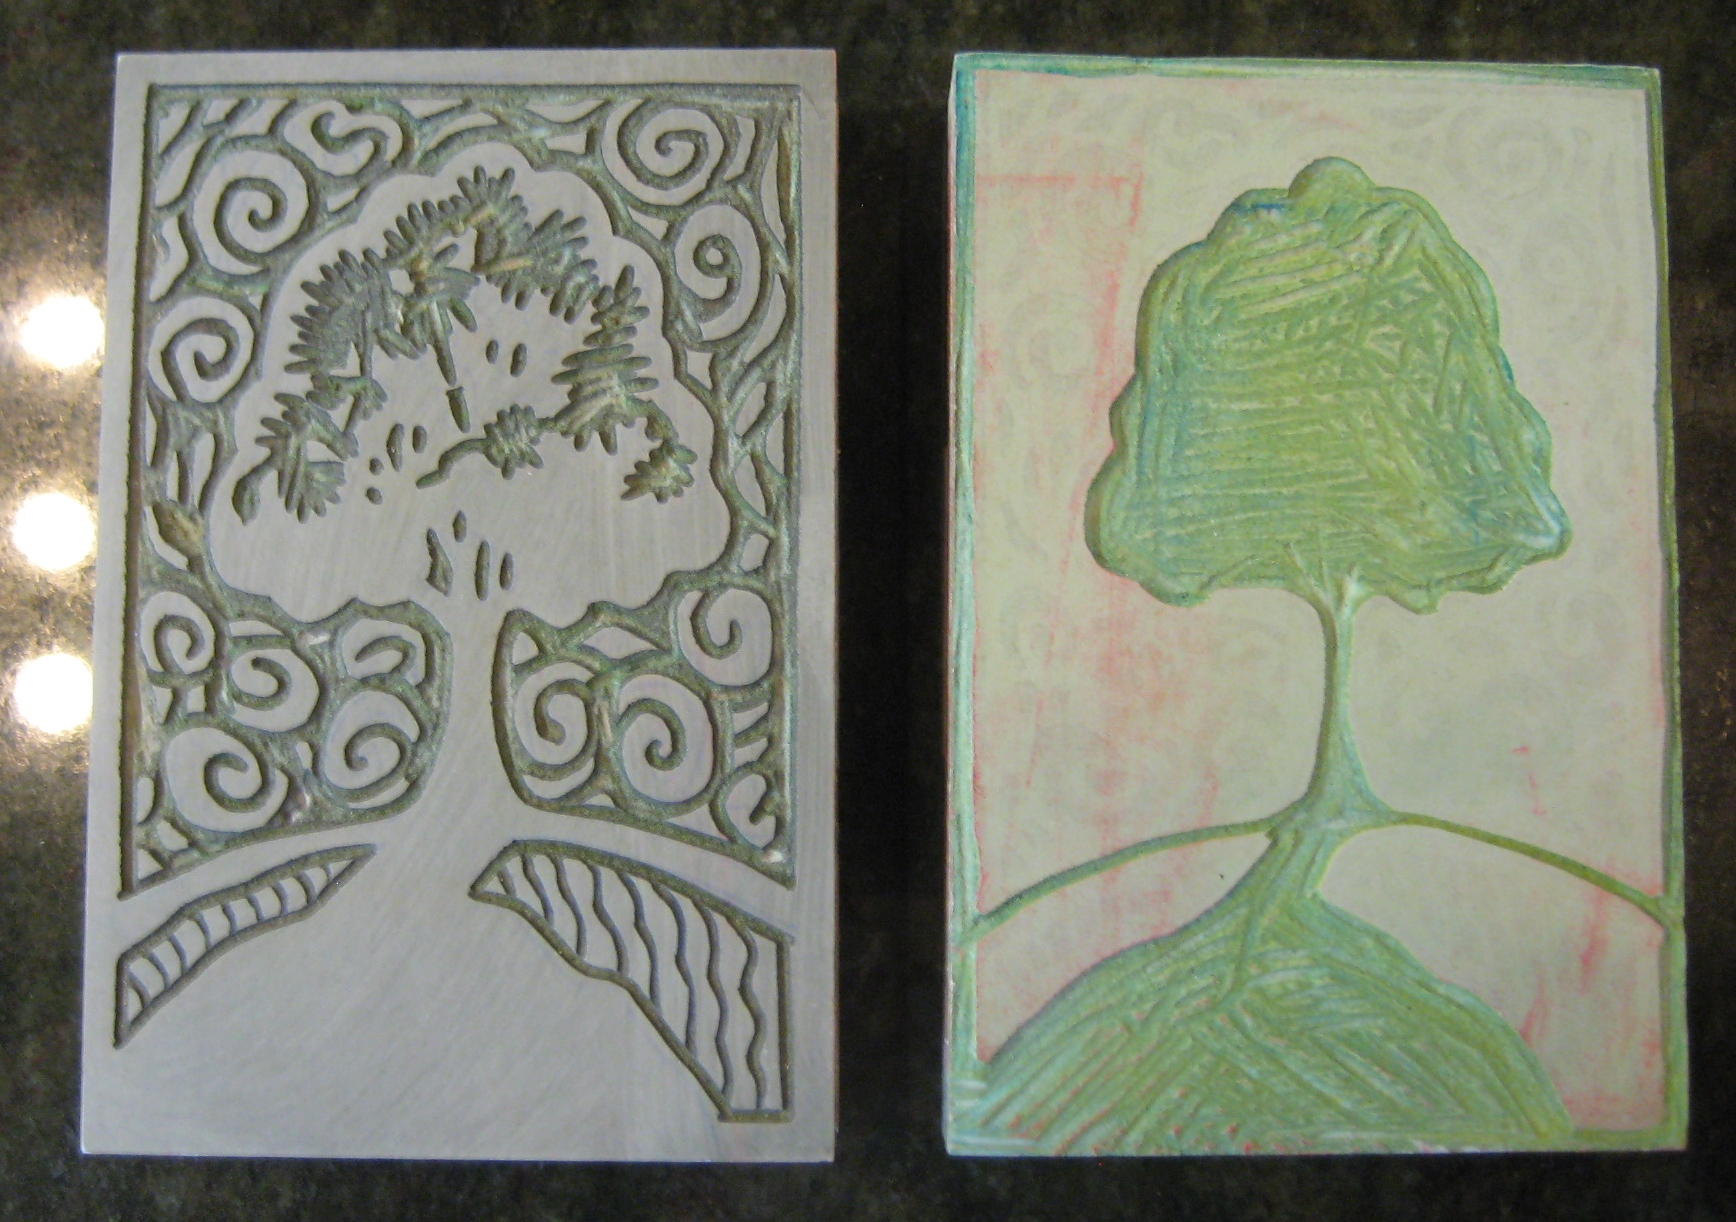 Two color linoleum block plates